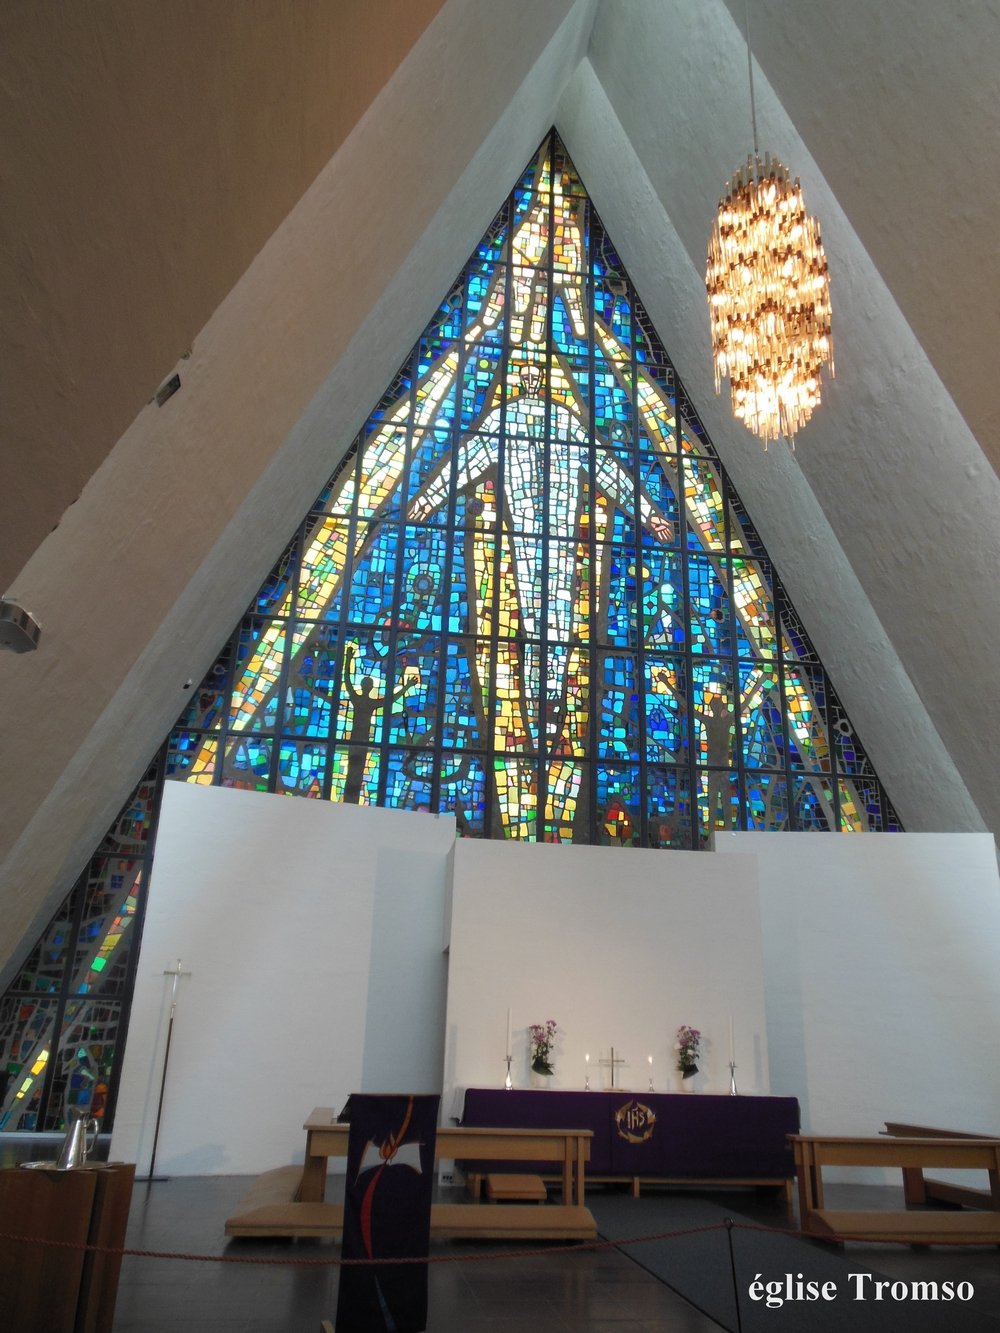 norvege-églisetromso)